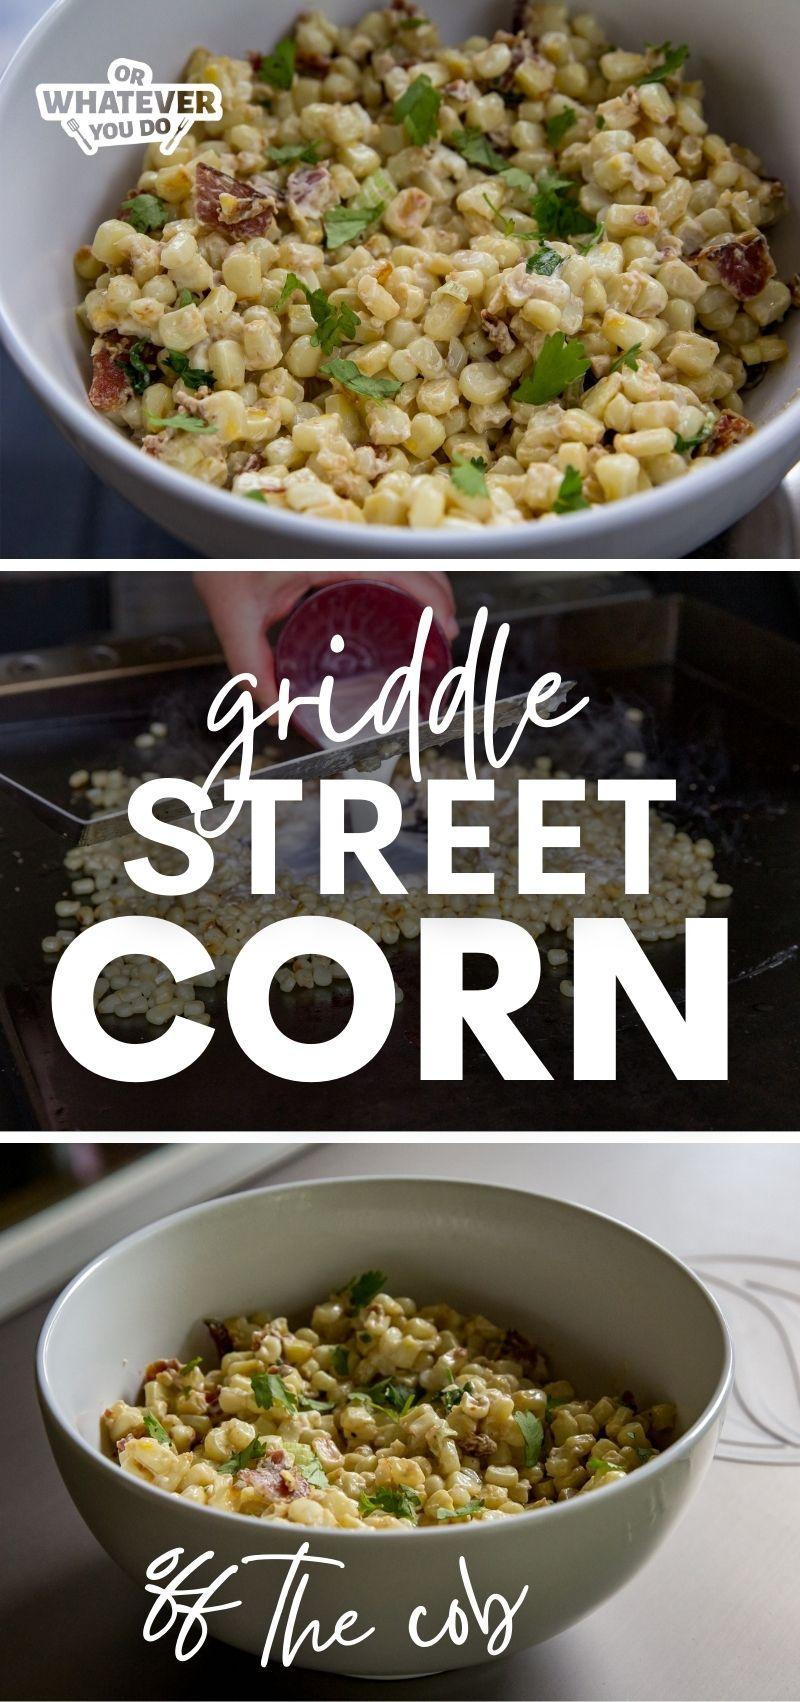 Griddle Street Corn Off the Cob